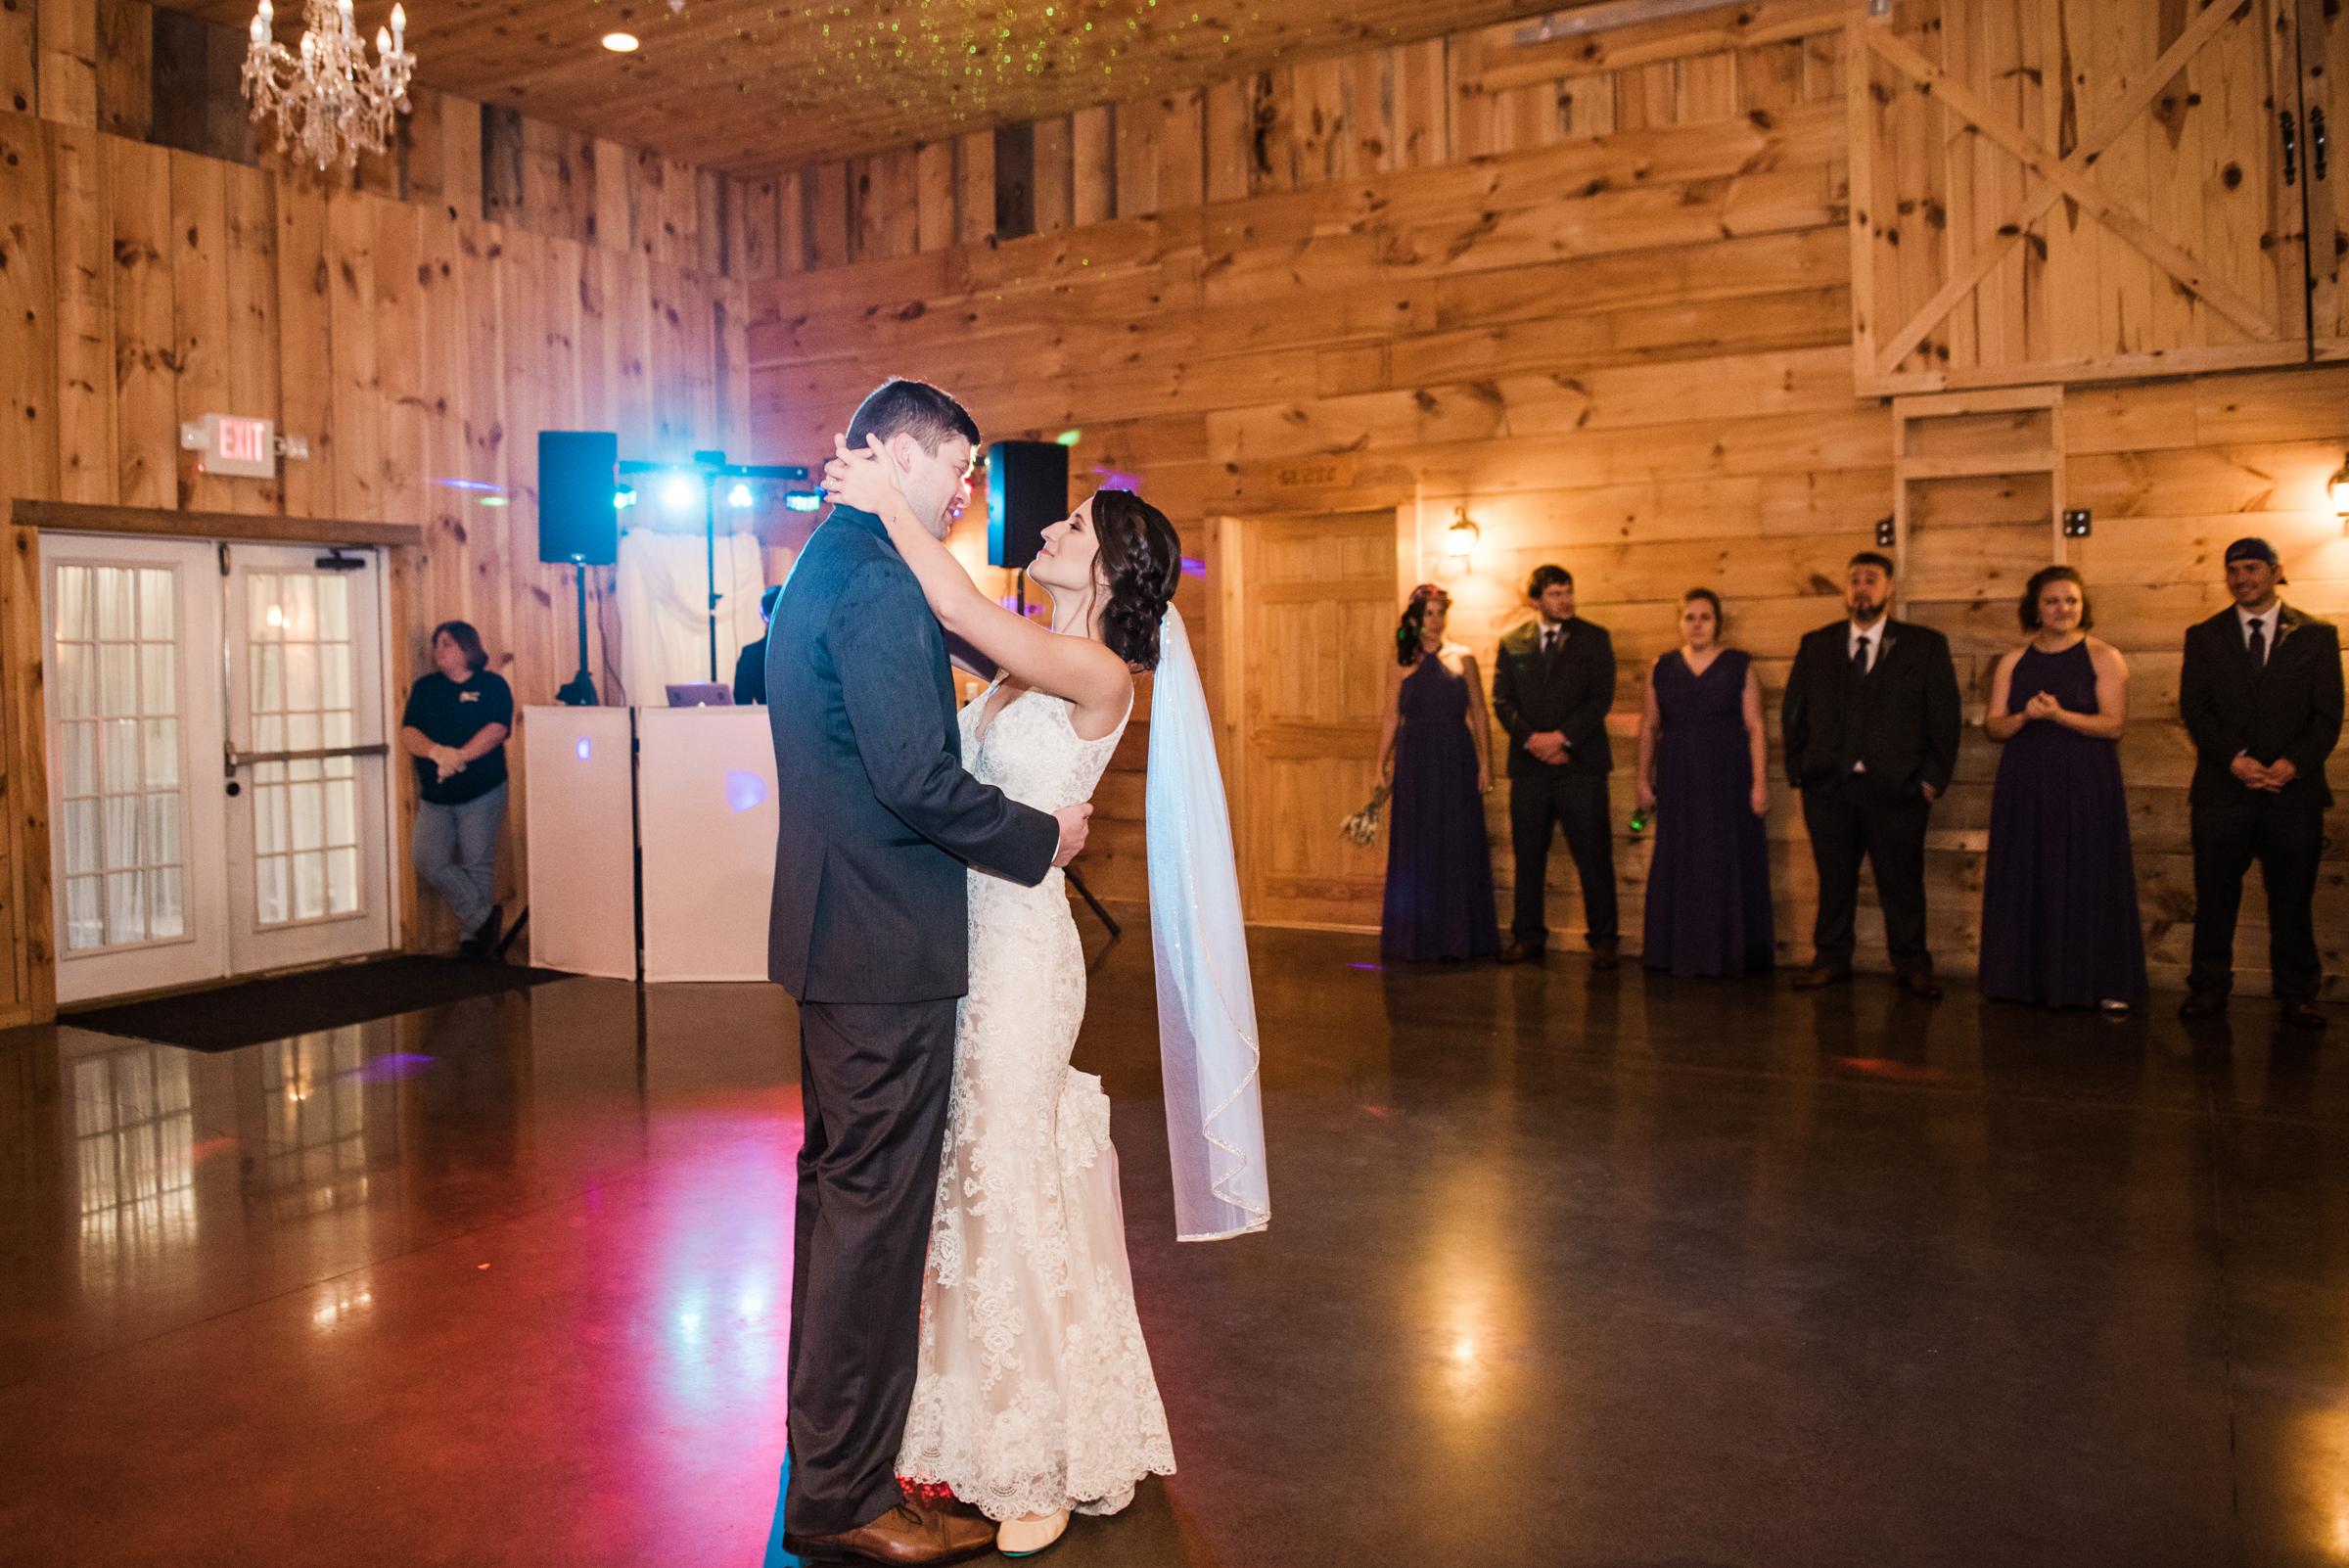 Wolf_Oak_Acres_Central_NY_Wedding_JILL_STUDIO_Rochester_NY_Photographer_DSC_7626.jpg